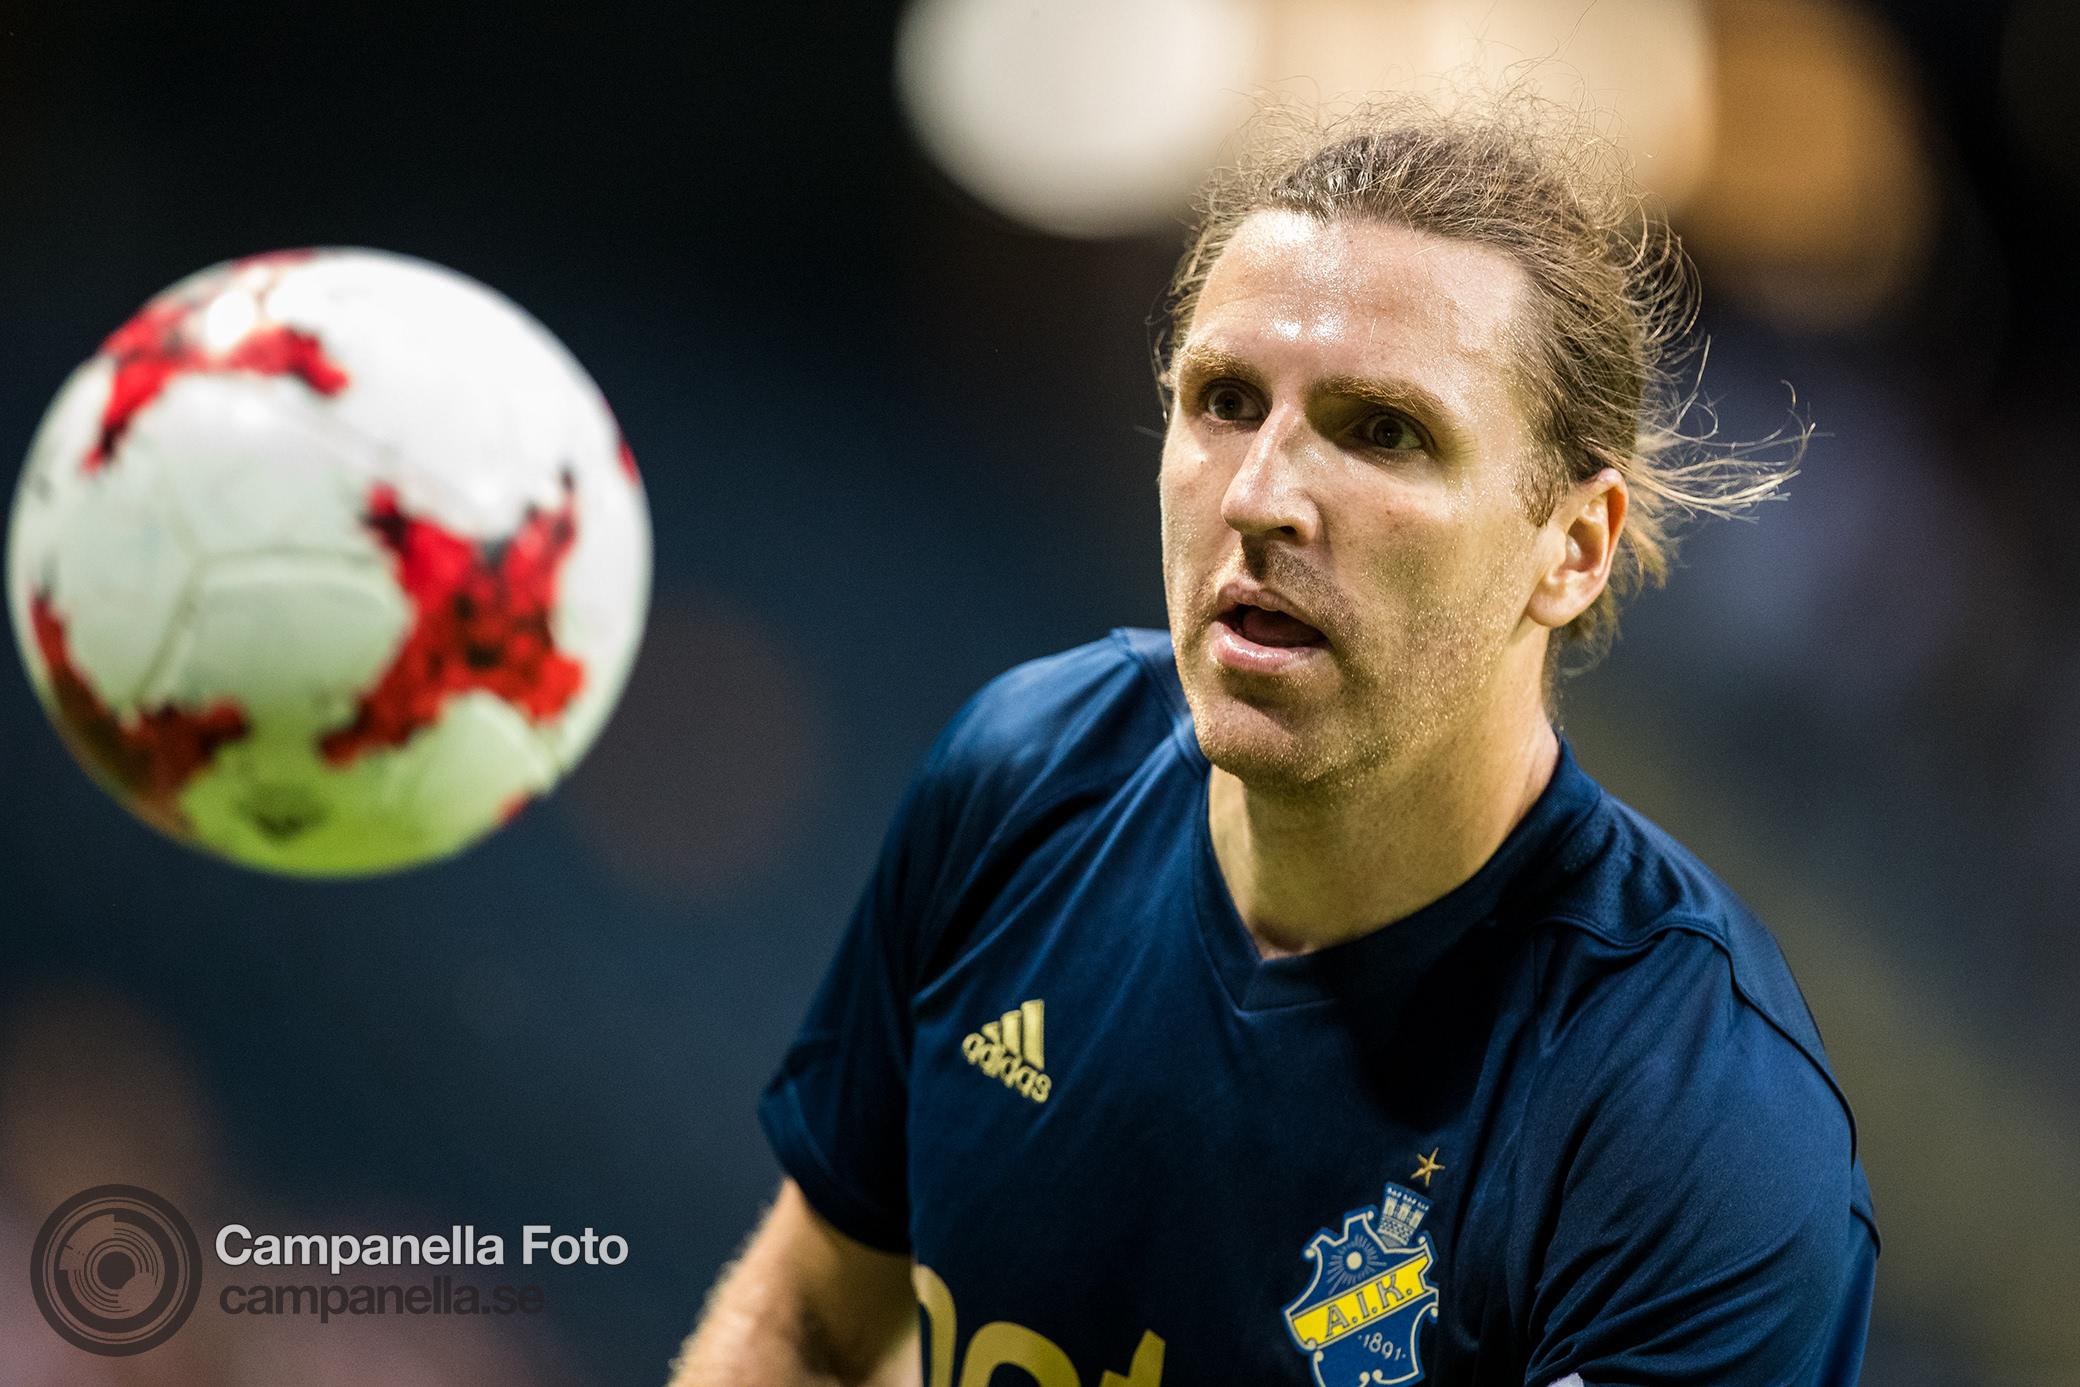 Sundgren penalty keeps hope alive for AIK - Michael Campanella Photography